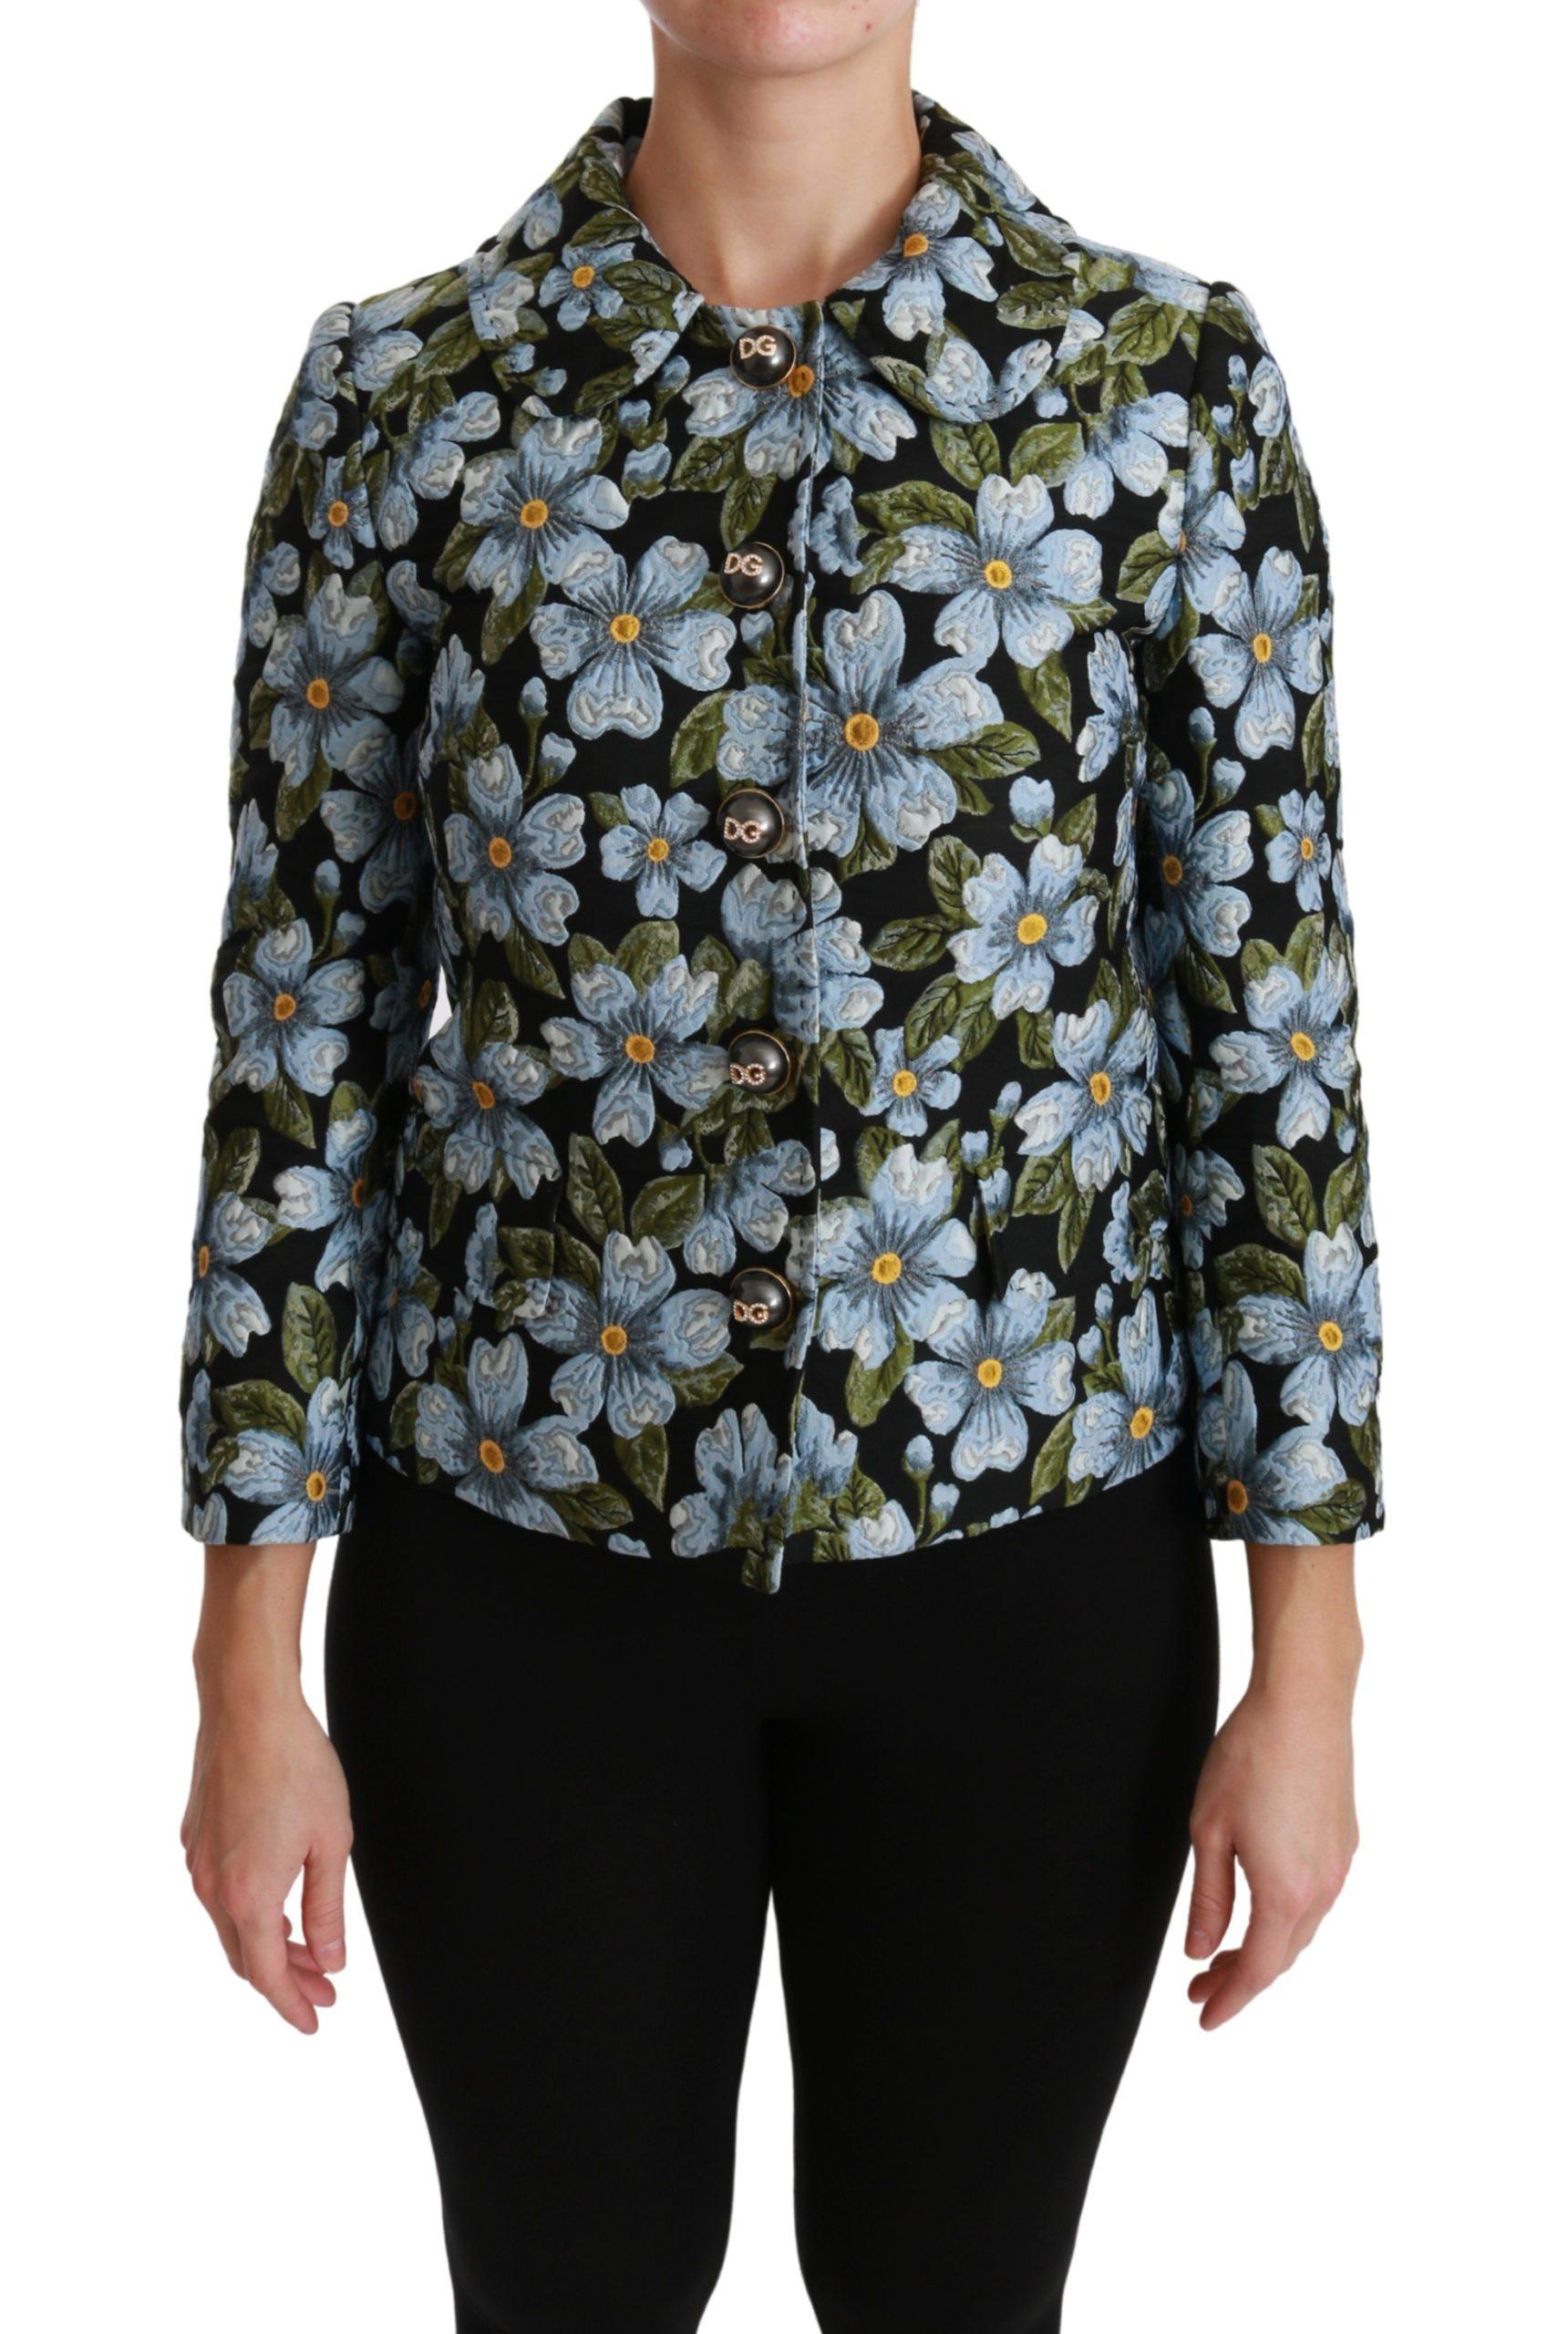 Dolce & Gabbana Women's Floral Coat Polyester Blazer Jacket Black JKT2565 - IT40 S